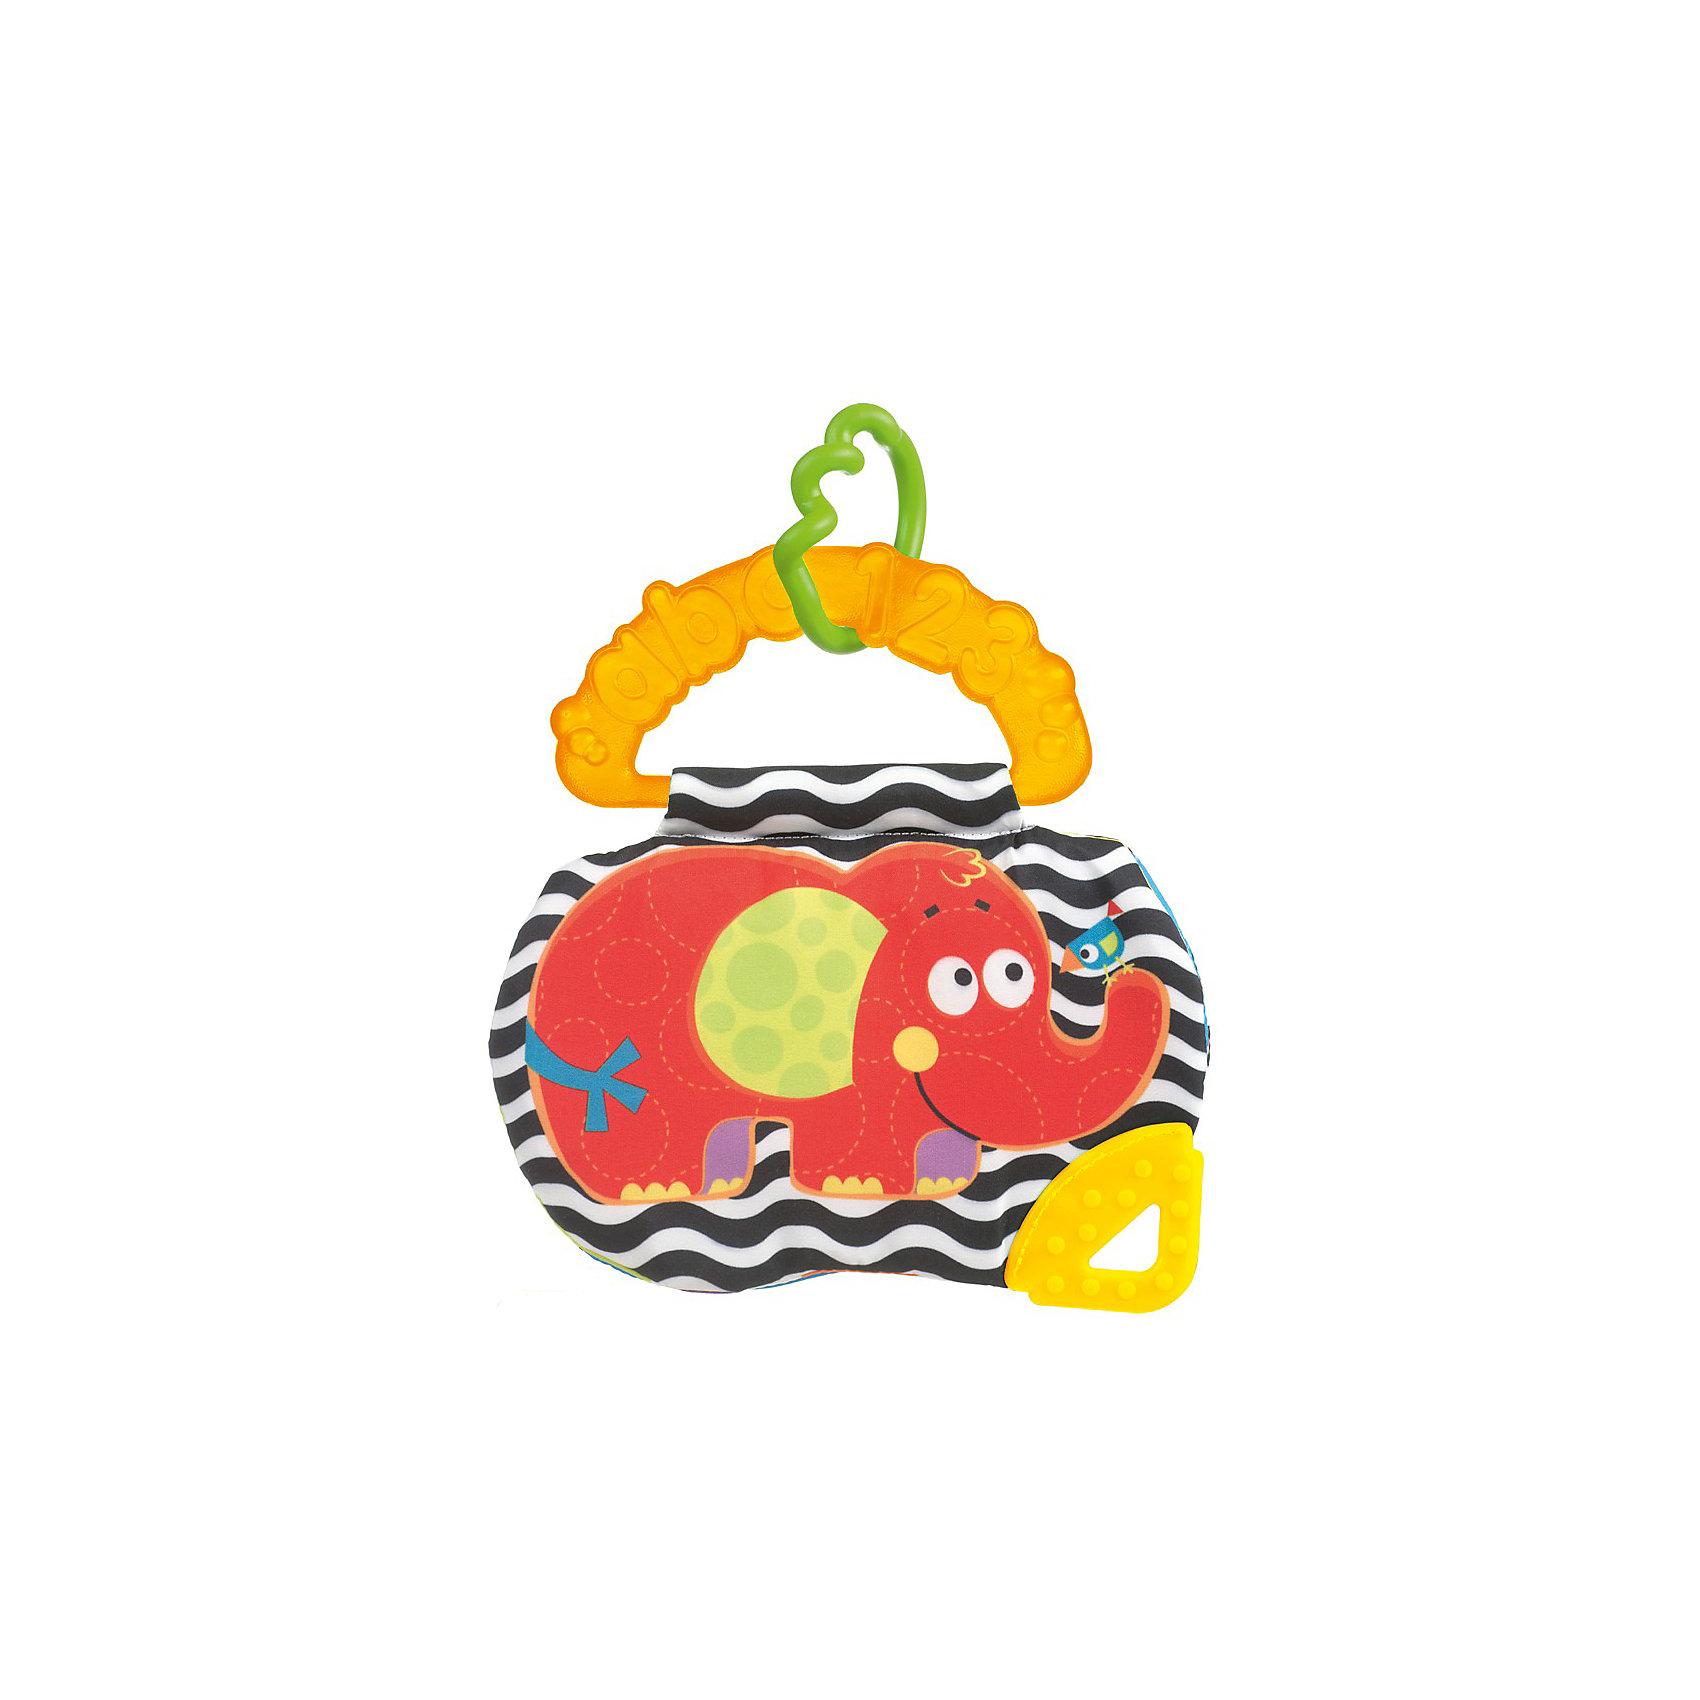 Playgro Книжка-прорезыватель Слоник, Playgro прорезыватели playgro книжка прорезыватель ферма